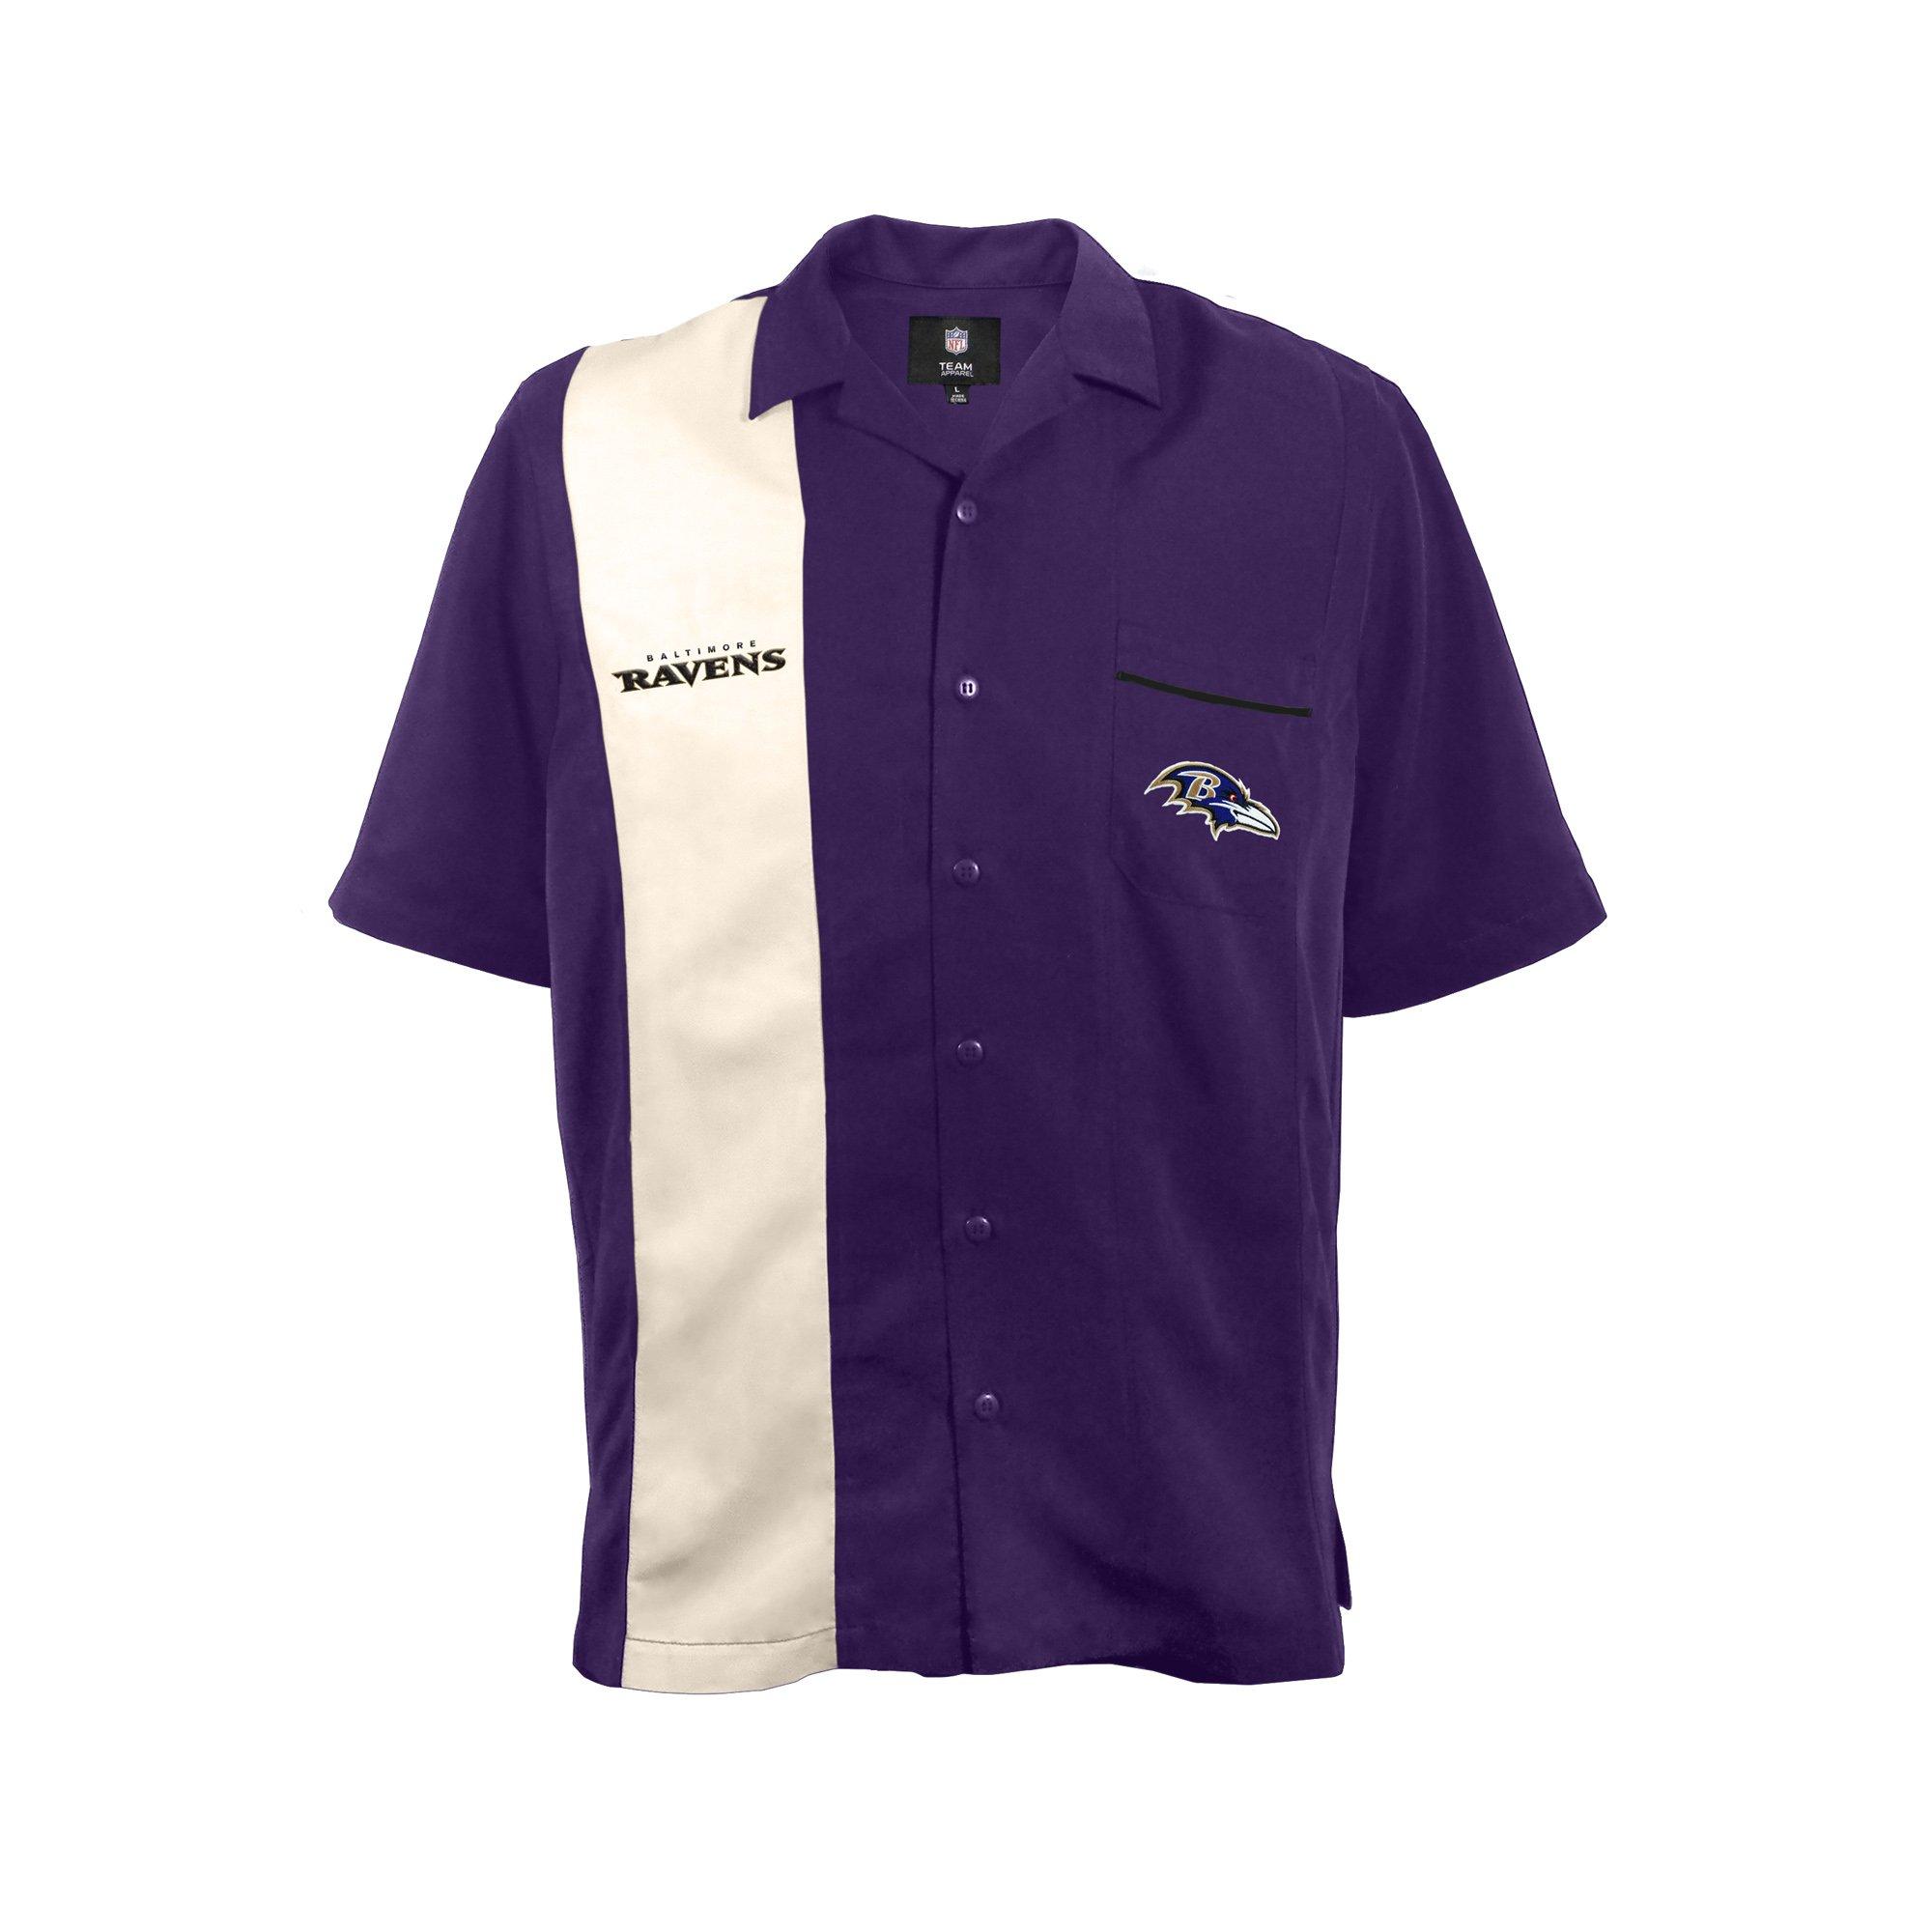 NFL Baltimore Ravens Strike Bowling Shirt, XXL by Littlearth